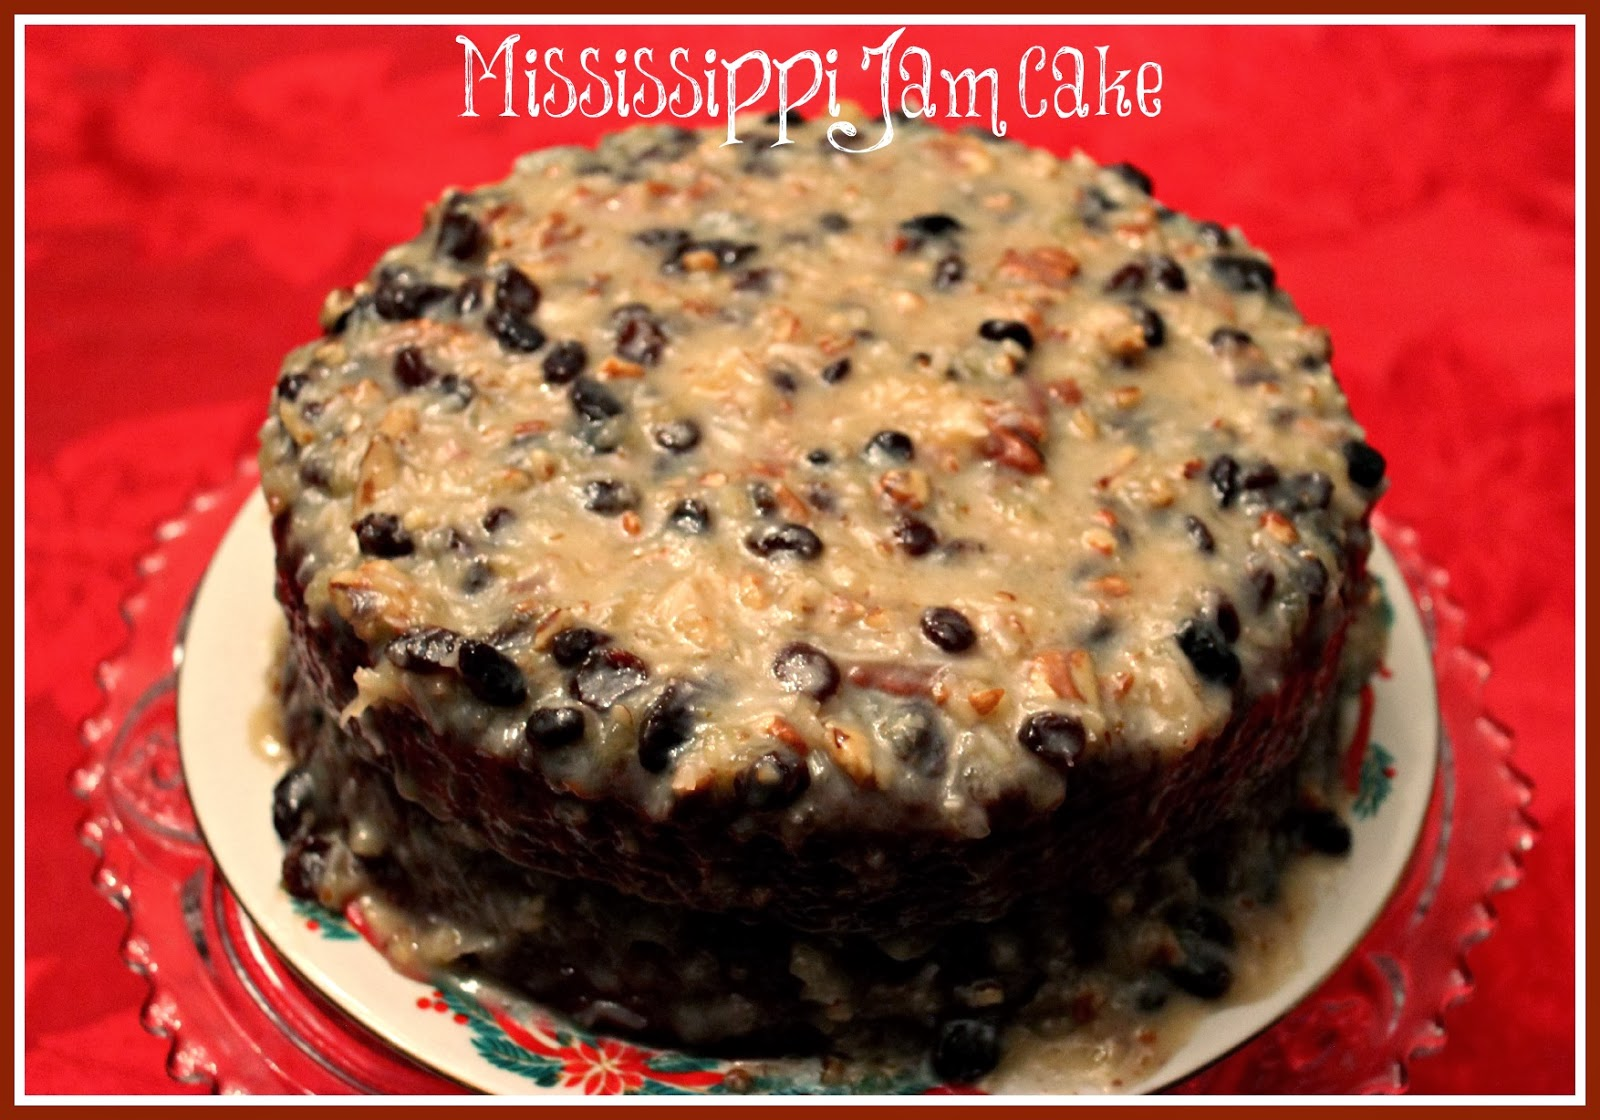 Jelly Cake Recipe Uk: Sweet Tea And Cornbread: Aunt Tootsie's Mississippi Jam Cake